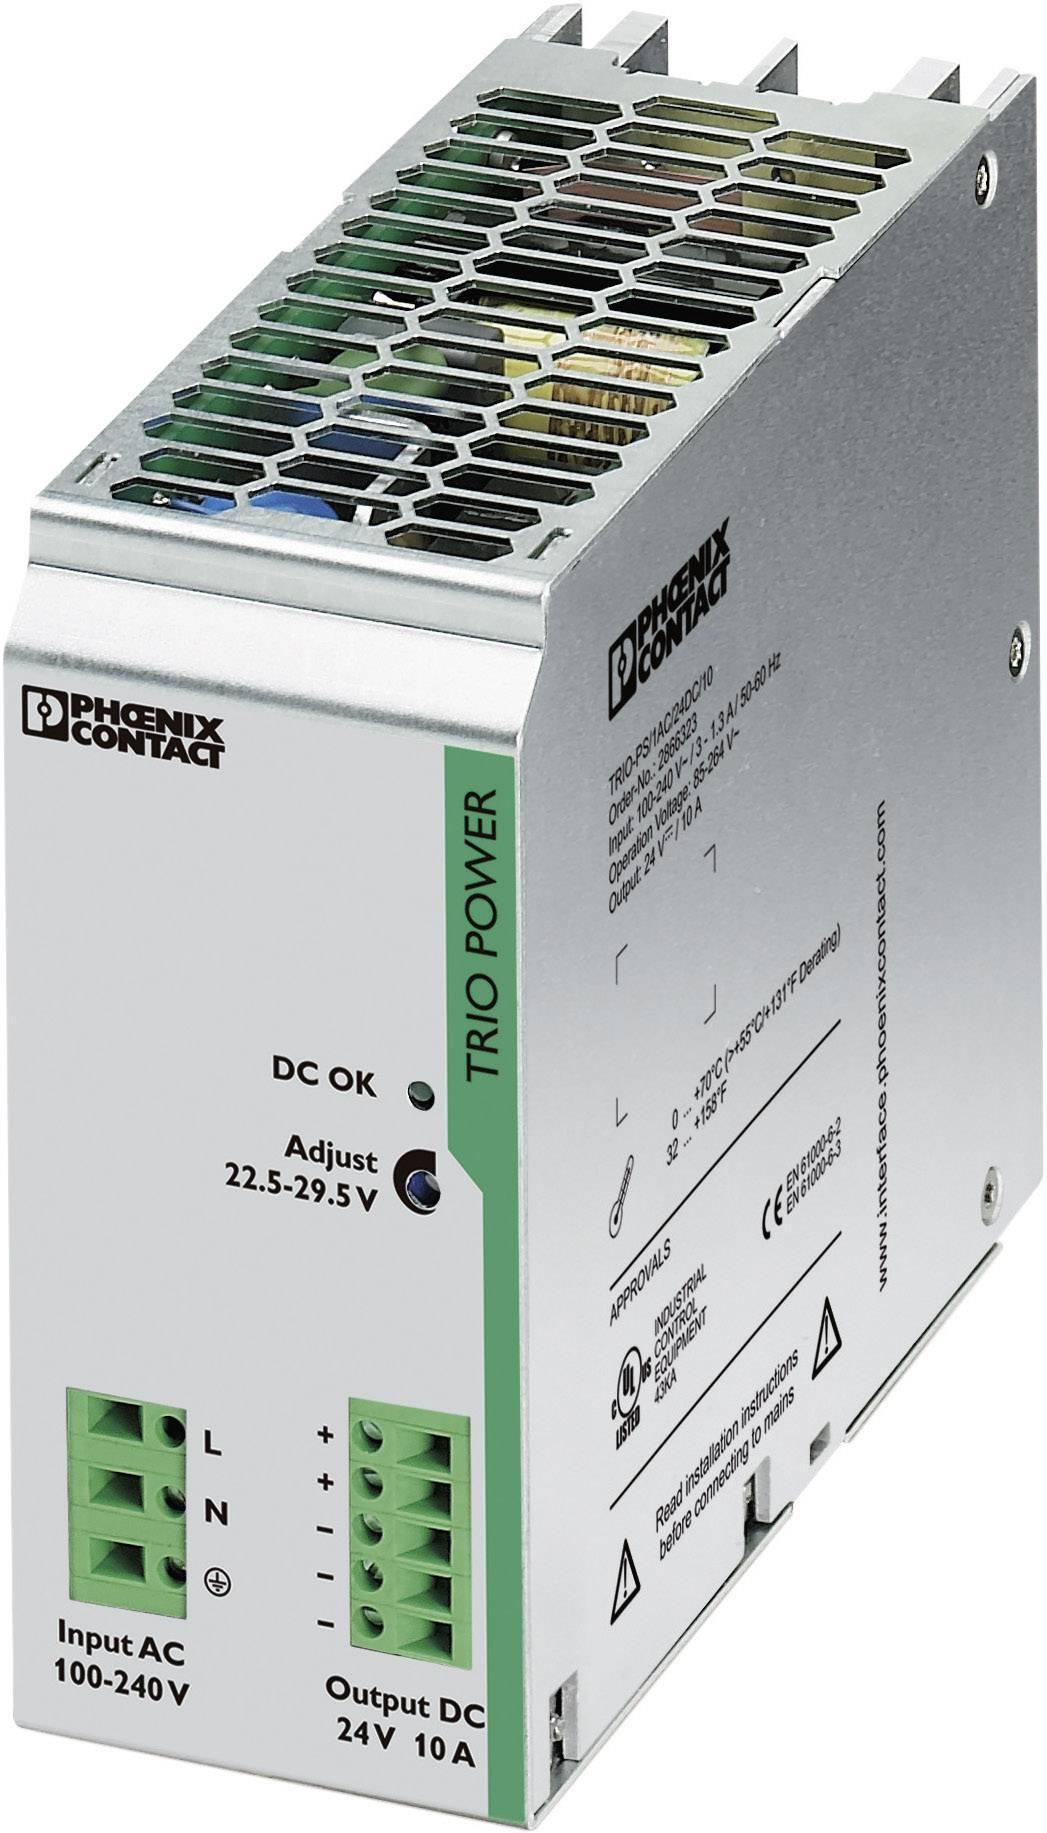 Sieťový zdroj na montážnu lištu (DIN lištu) Phoenix Contact TRIO-PS/1AC/24DC/10, 1 x, 24 V/DC, 10 A, 240 W